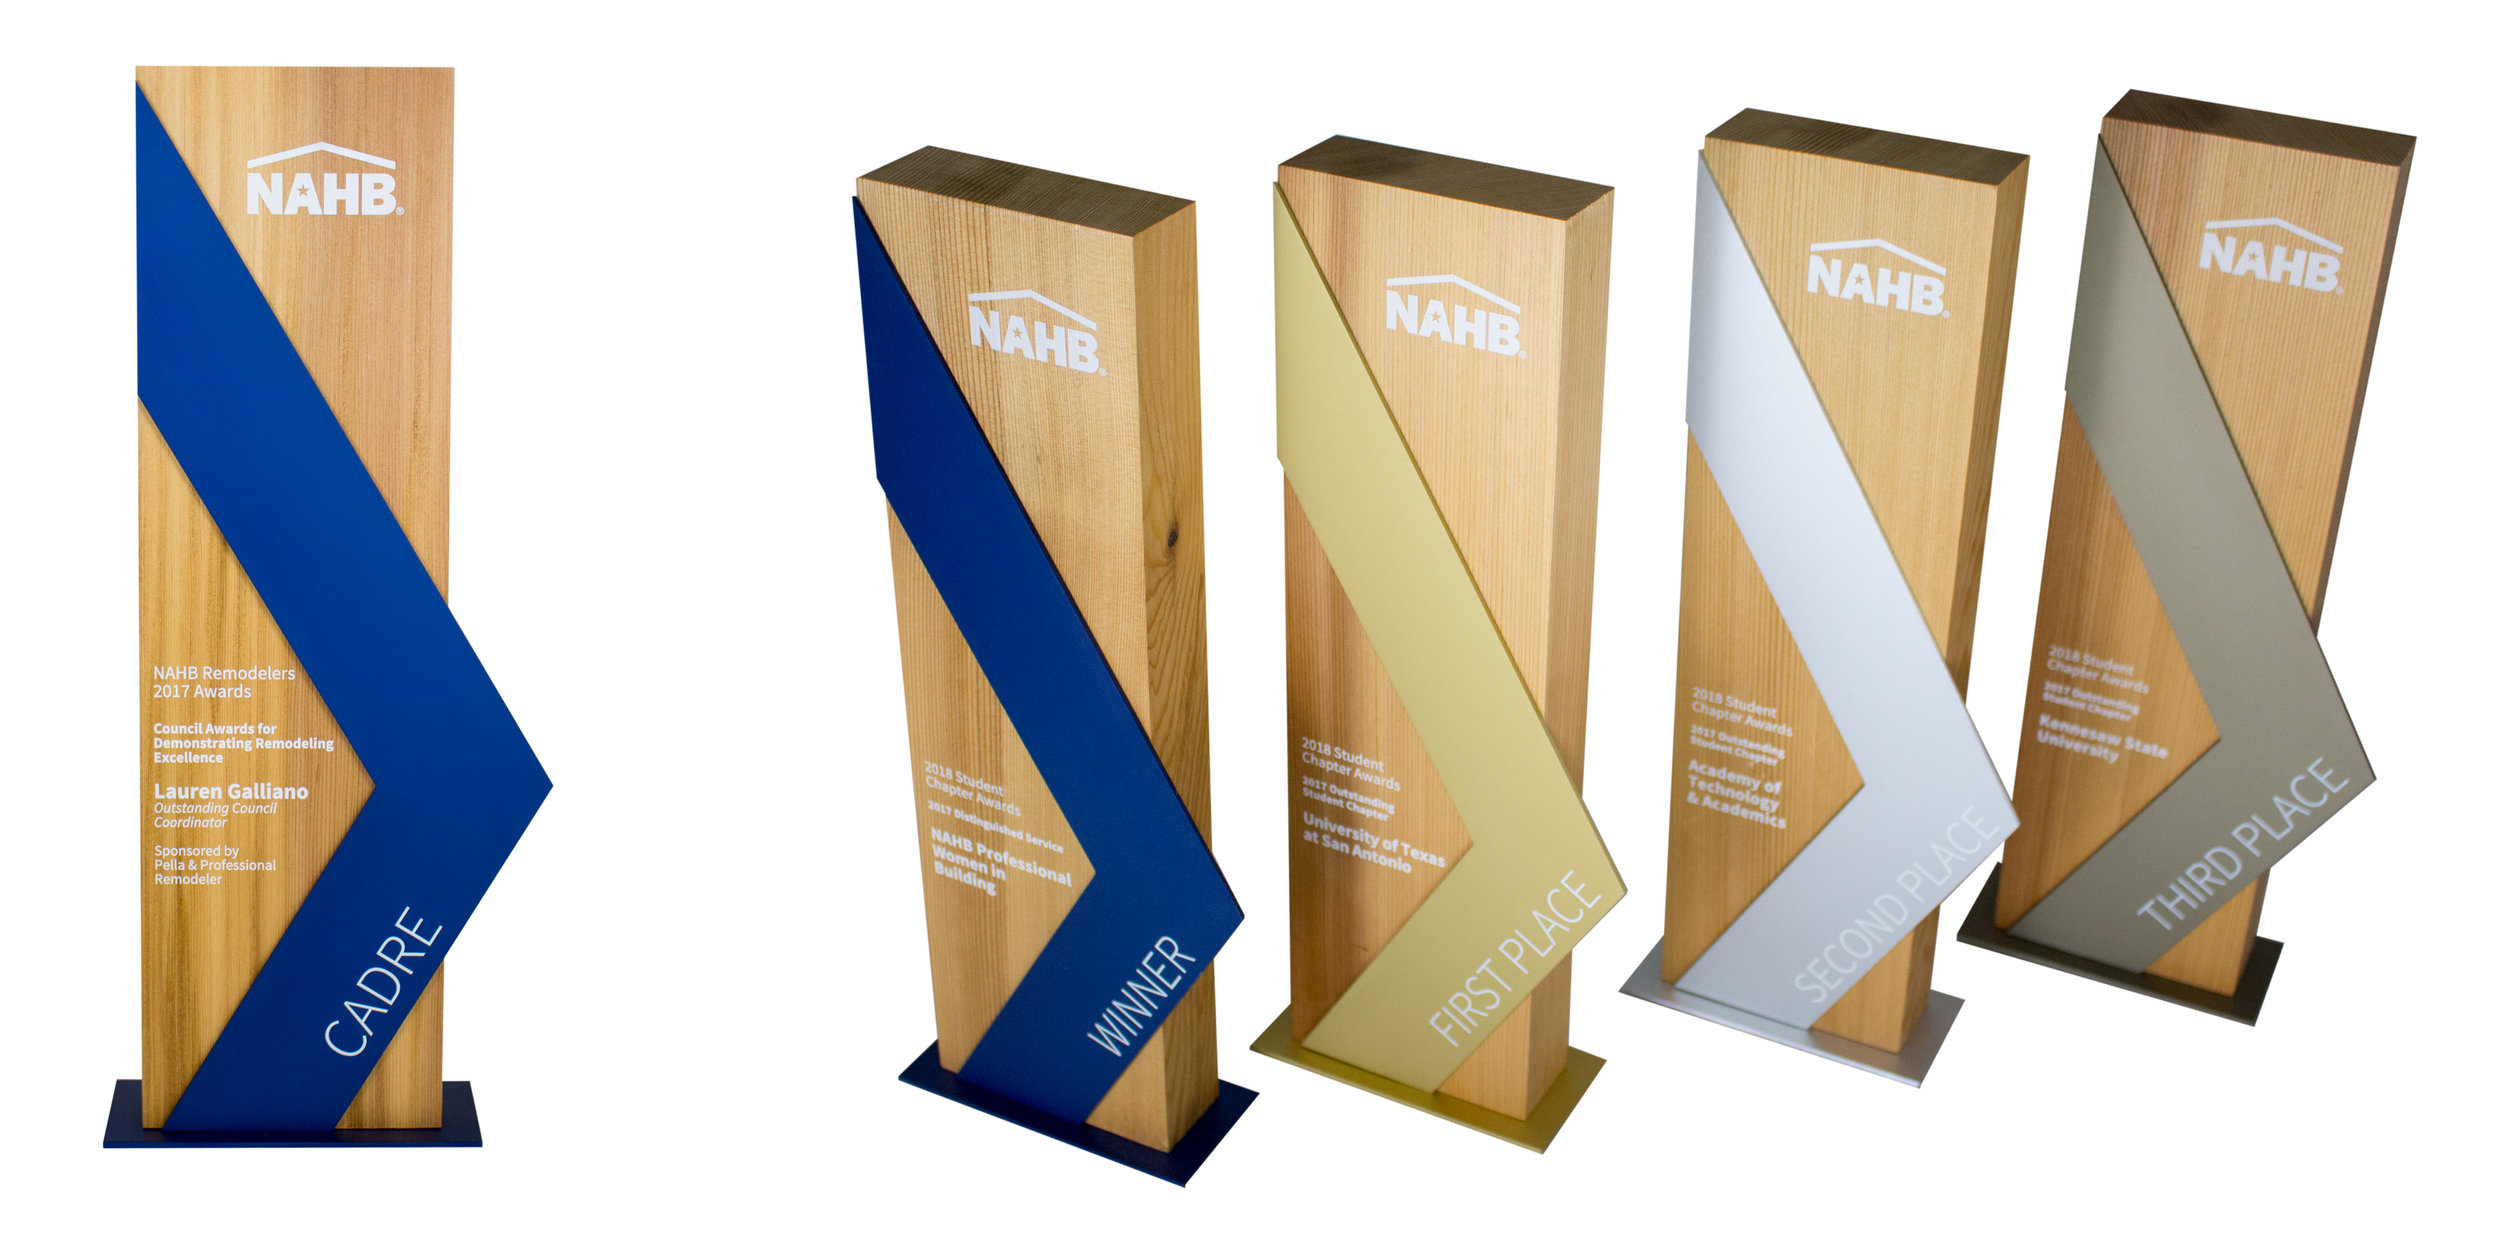 nahb national association of home builders awards modern design